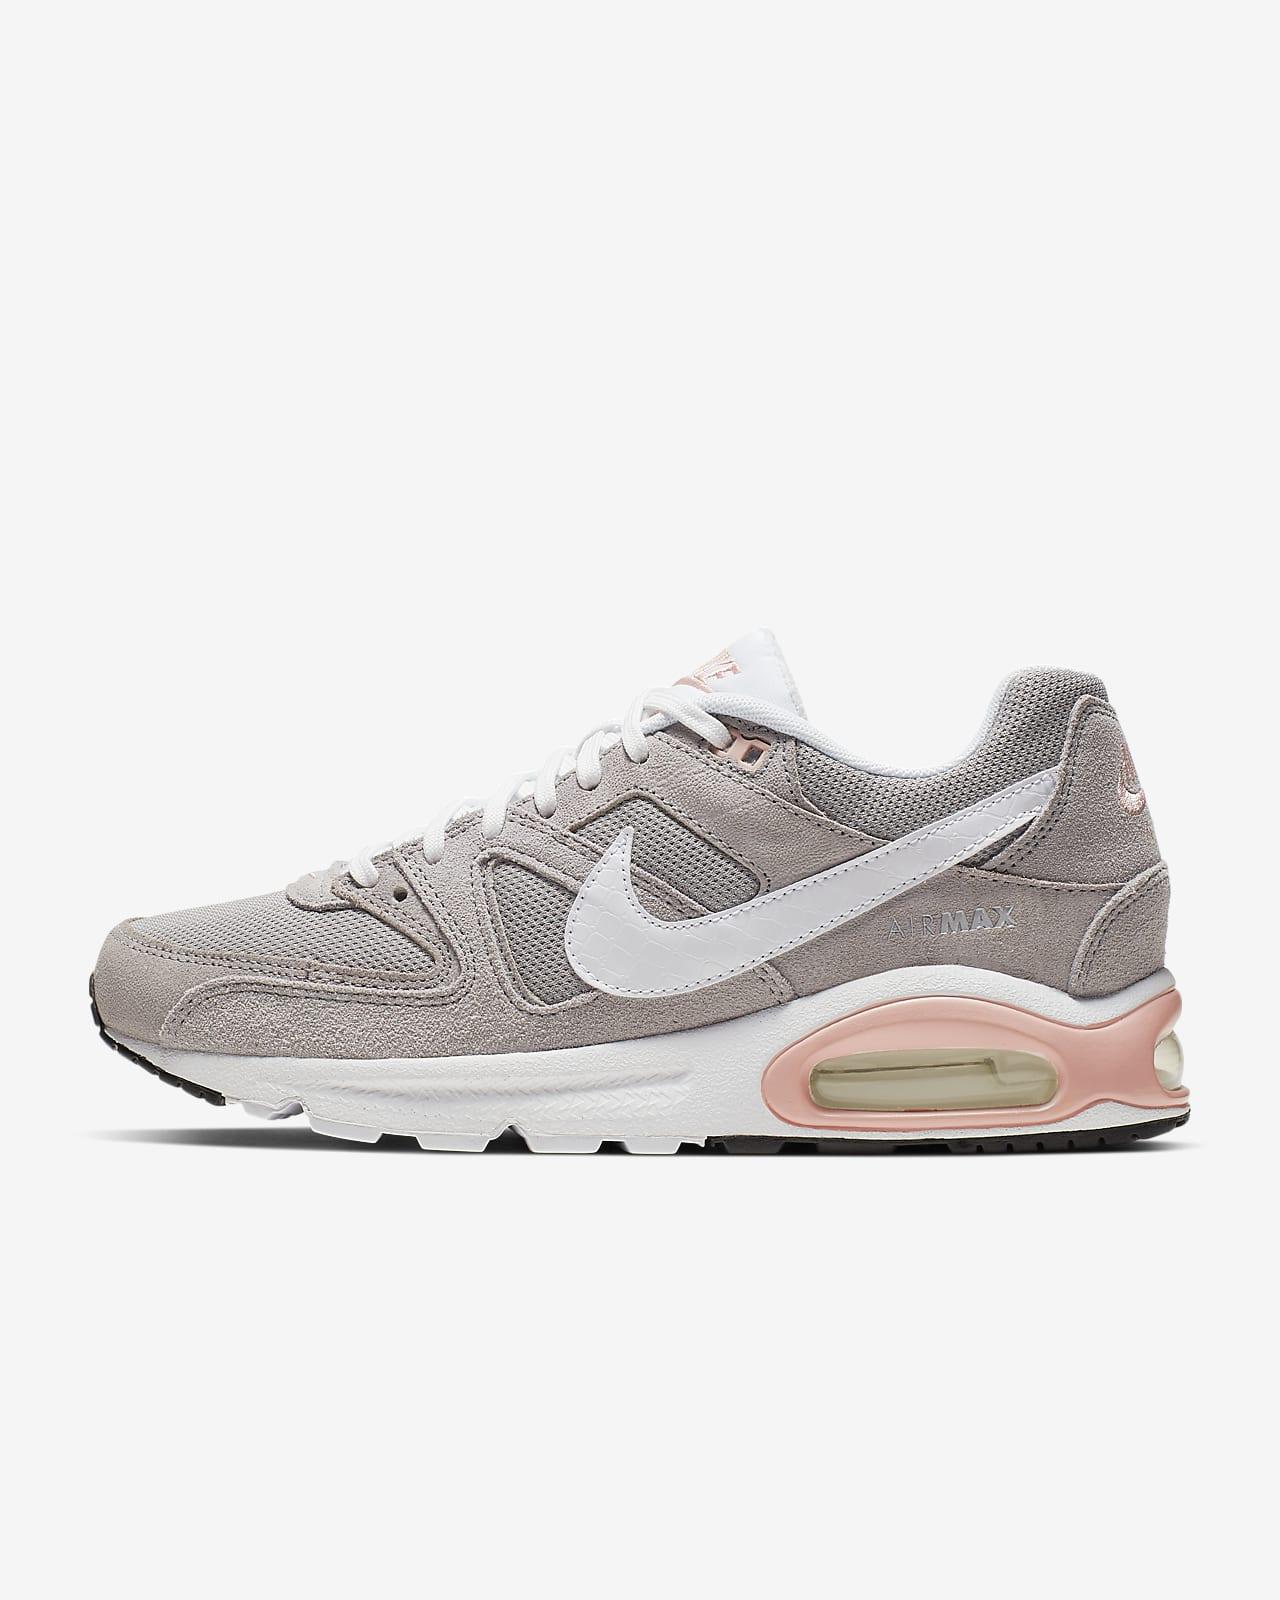 Nike Air Max Command Women's Shoe